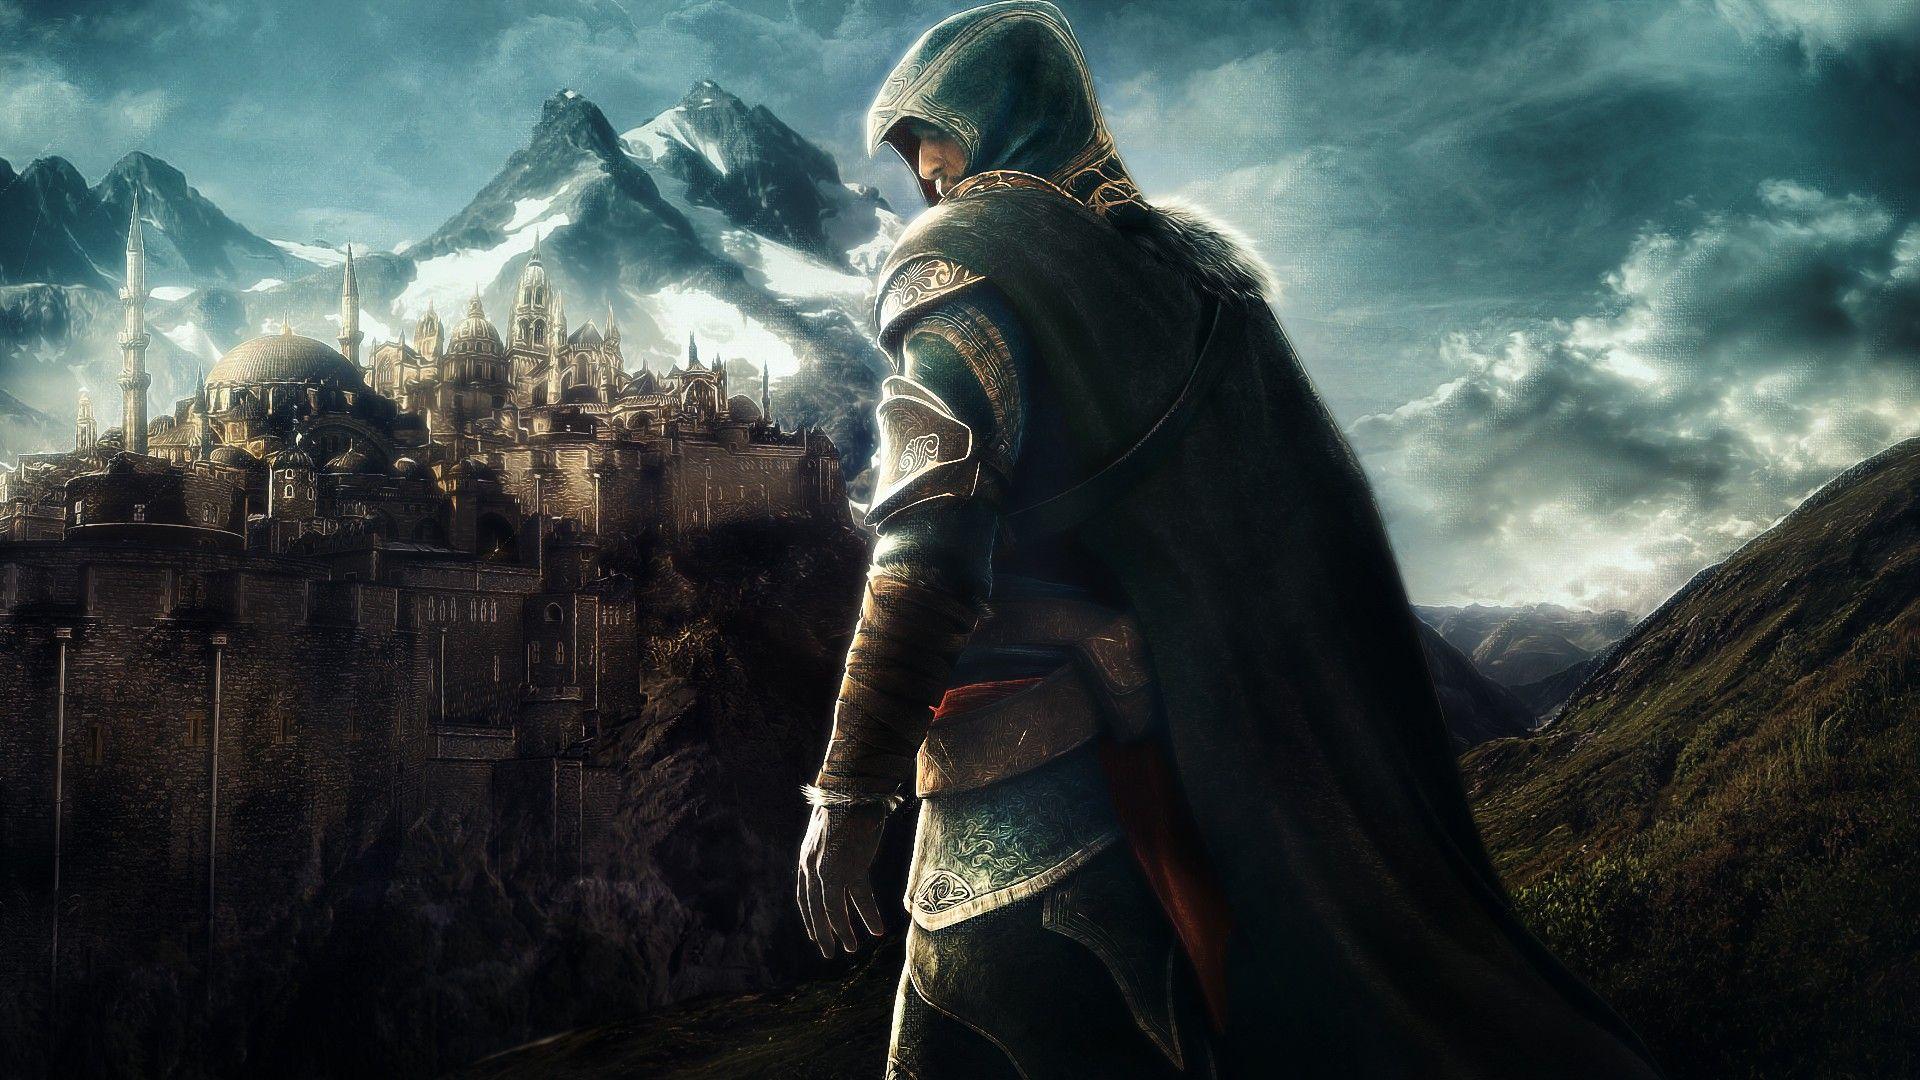 Creed Ezio 1080p Hd Wallpaper Games Gaming Wallpapers Assassin S Creed Wallpaper 4k Gaming Wallpaper